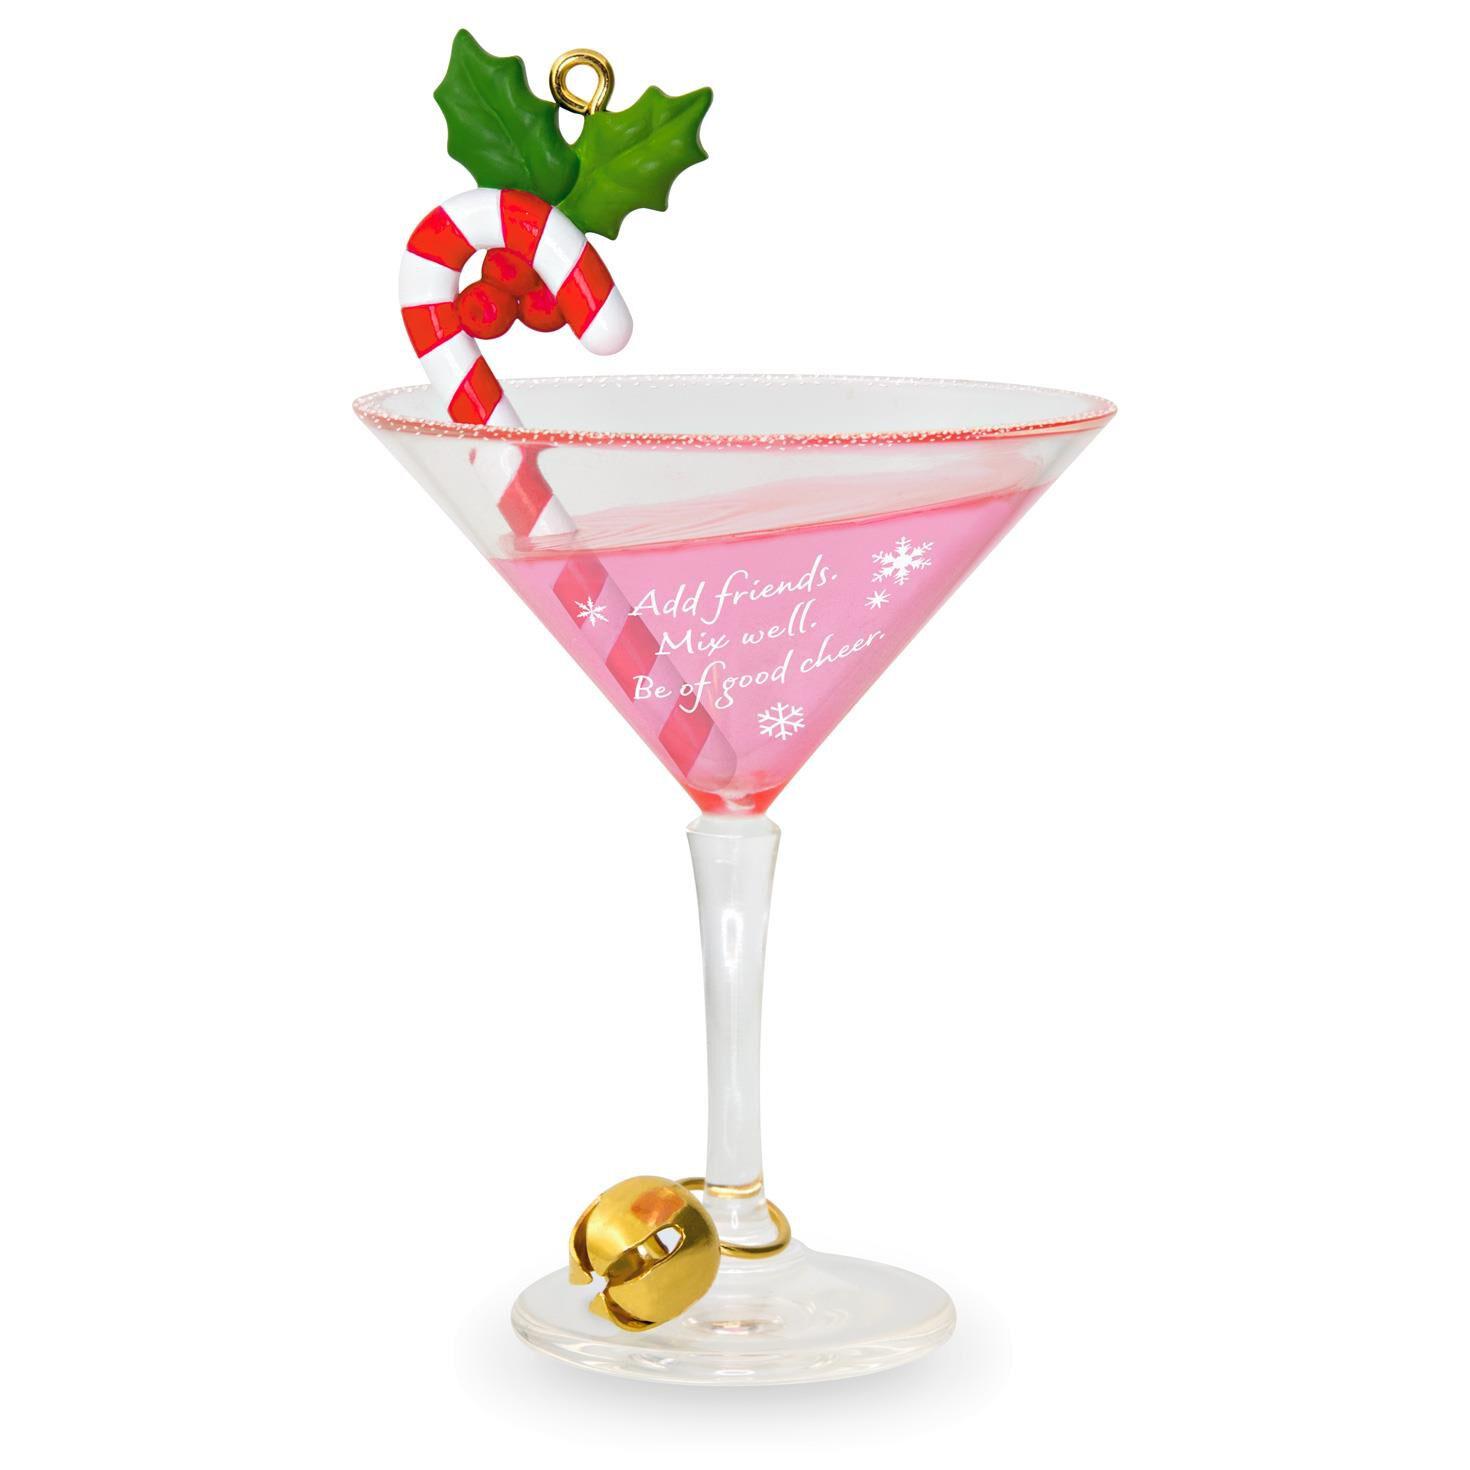 Glass candy cane ornaments - Festive Candy Cane Drink Ornament Keepsake Ornaments Hallmark